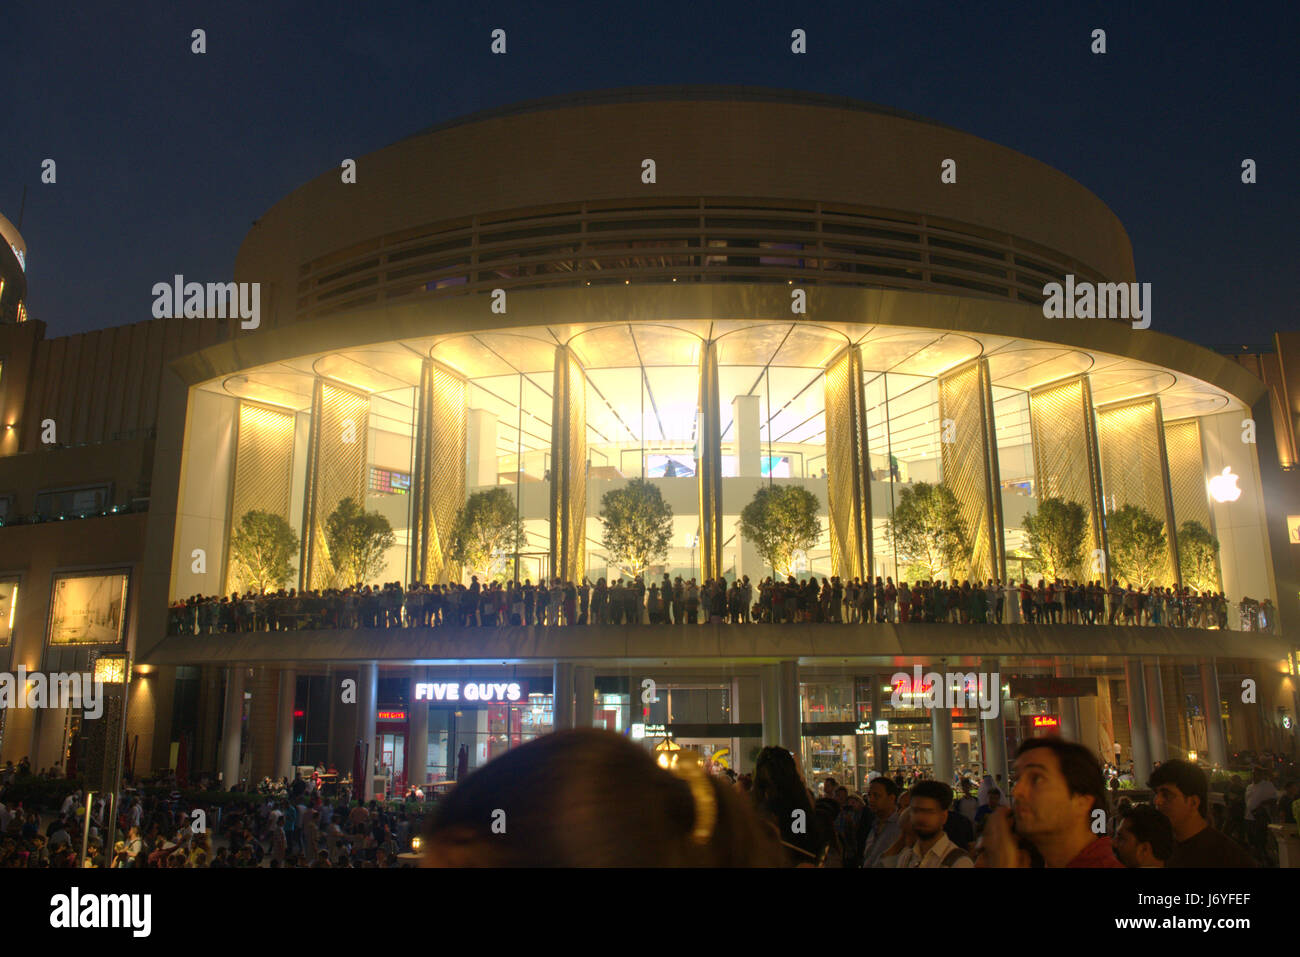 New Apple store in Mall of the Emirates, Dubai United Arab Emirates Stock Photo